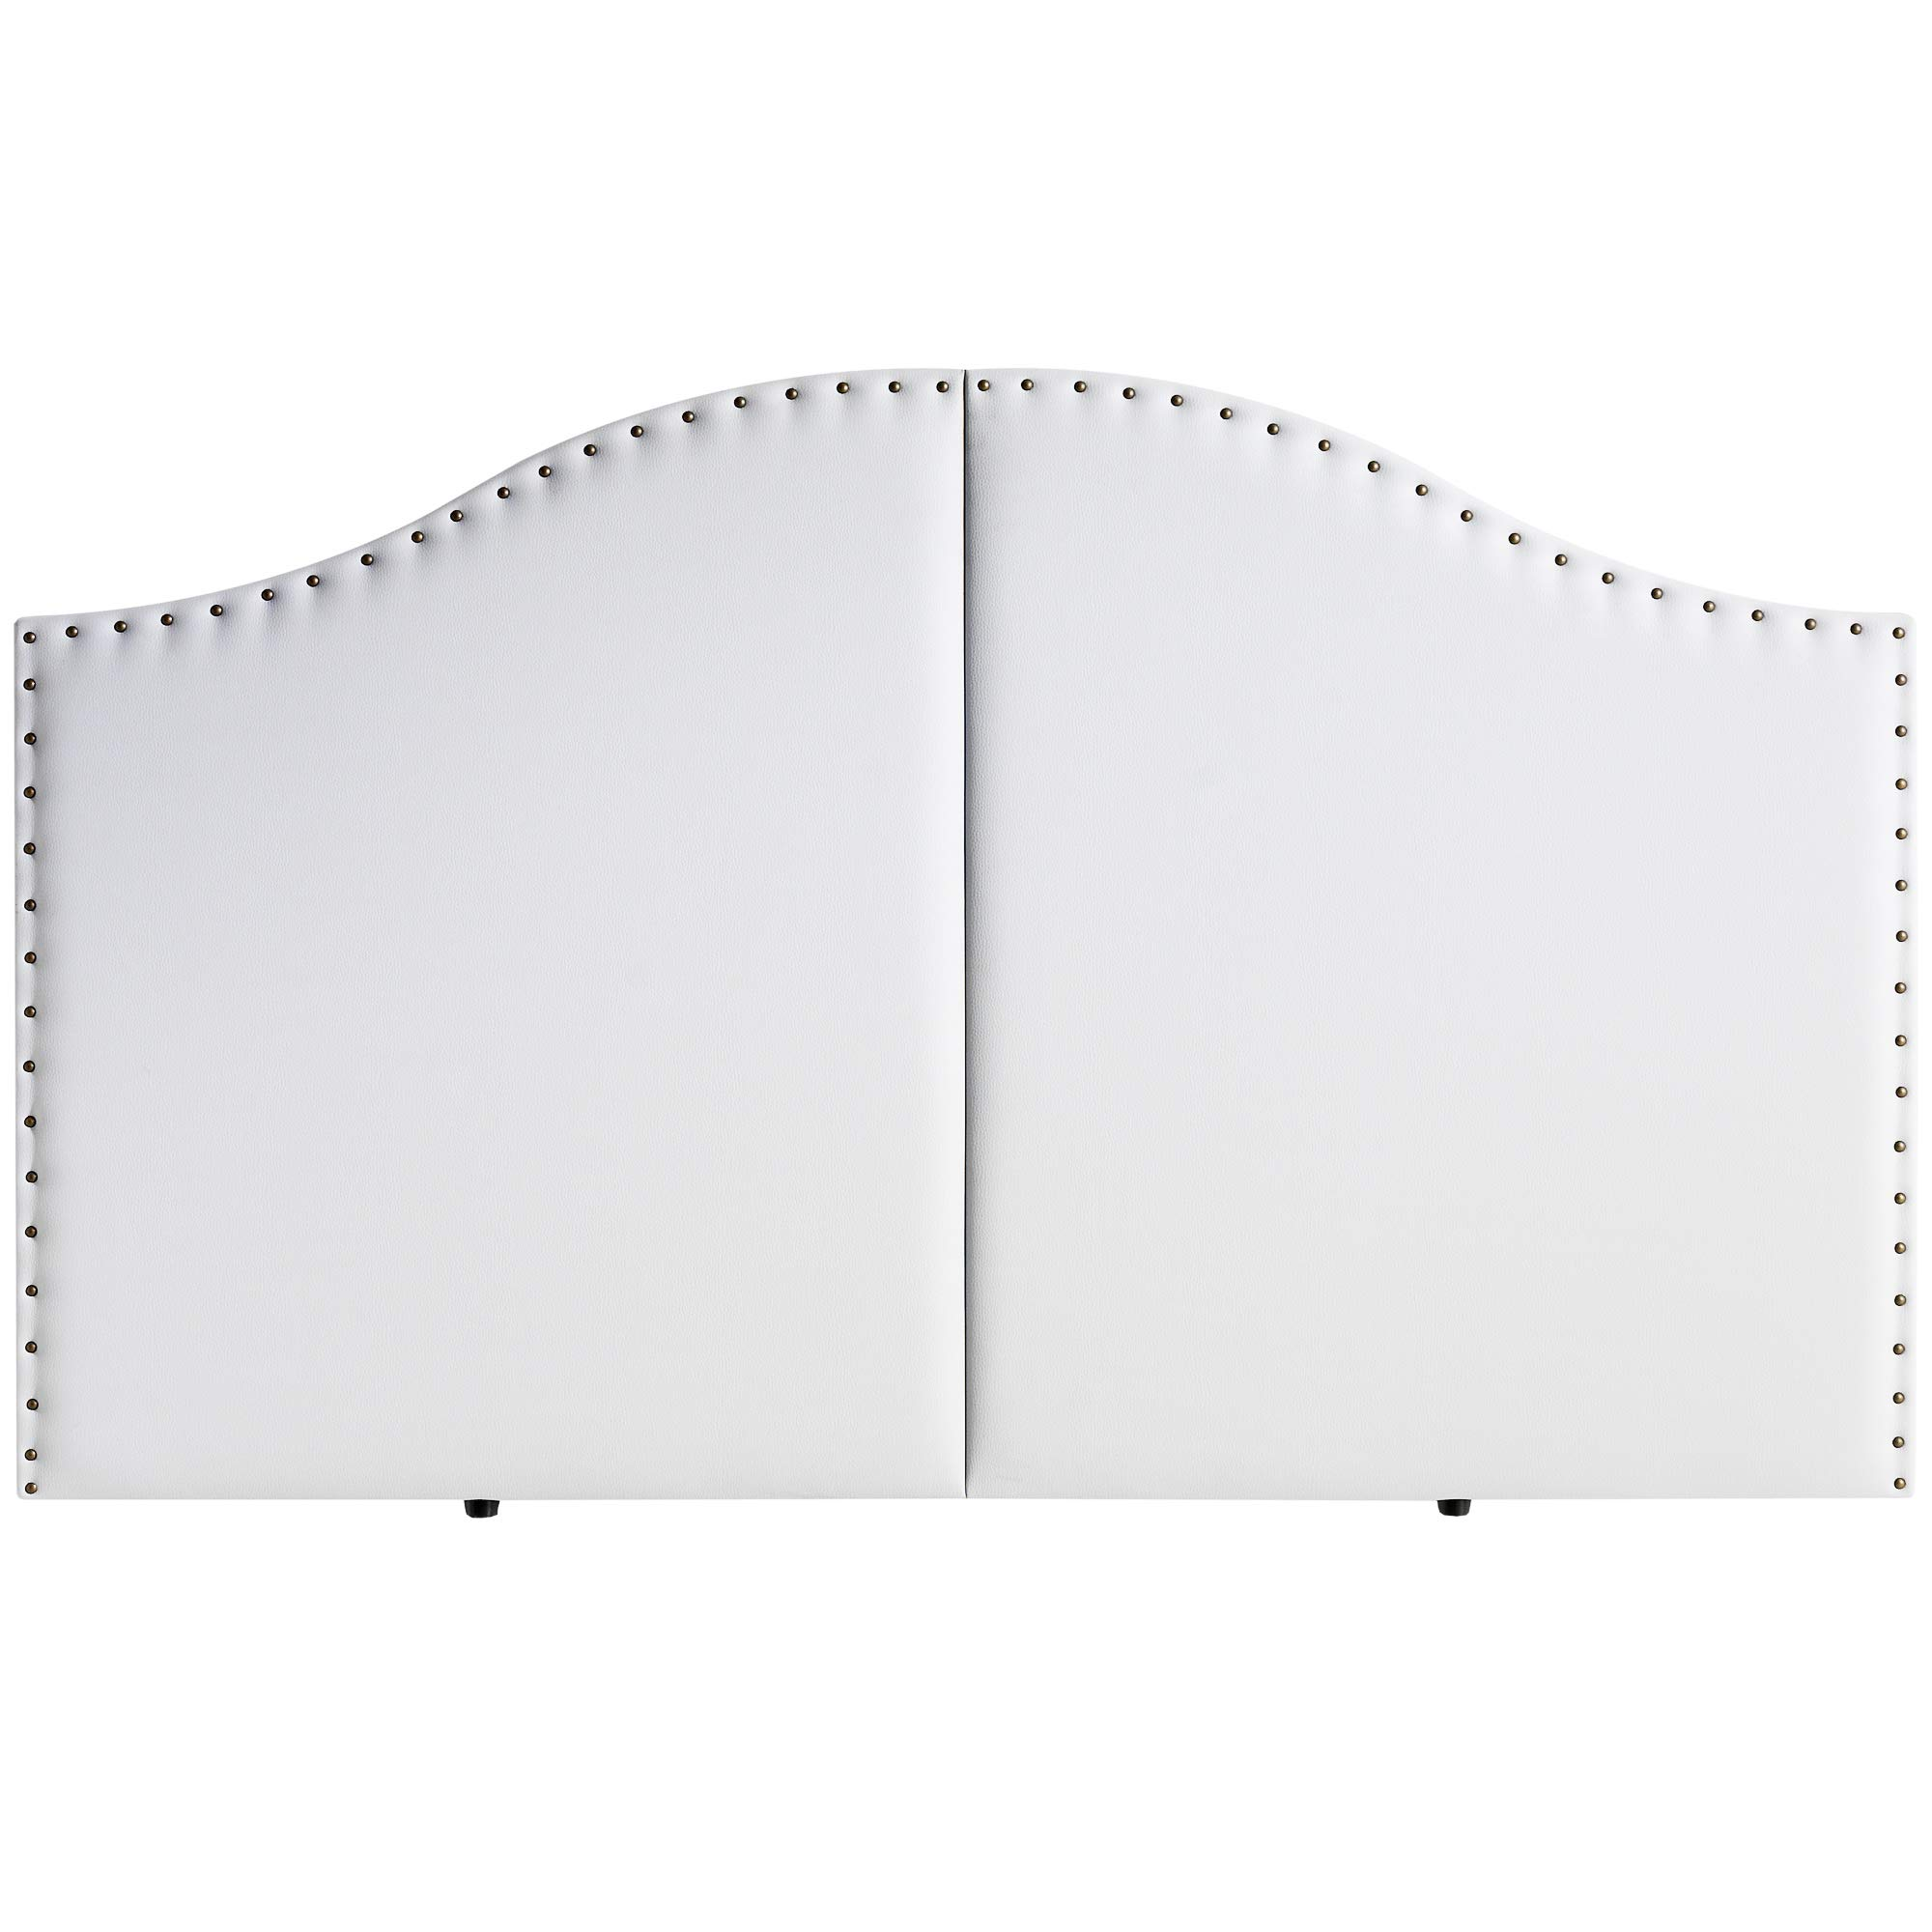 Marckonfort Cabezal Partido tapizado Lyon 160X95 con Tachuelas Blanco product image